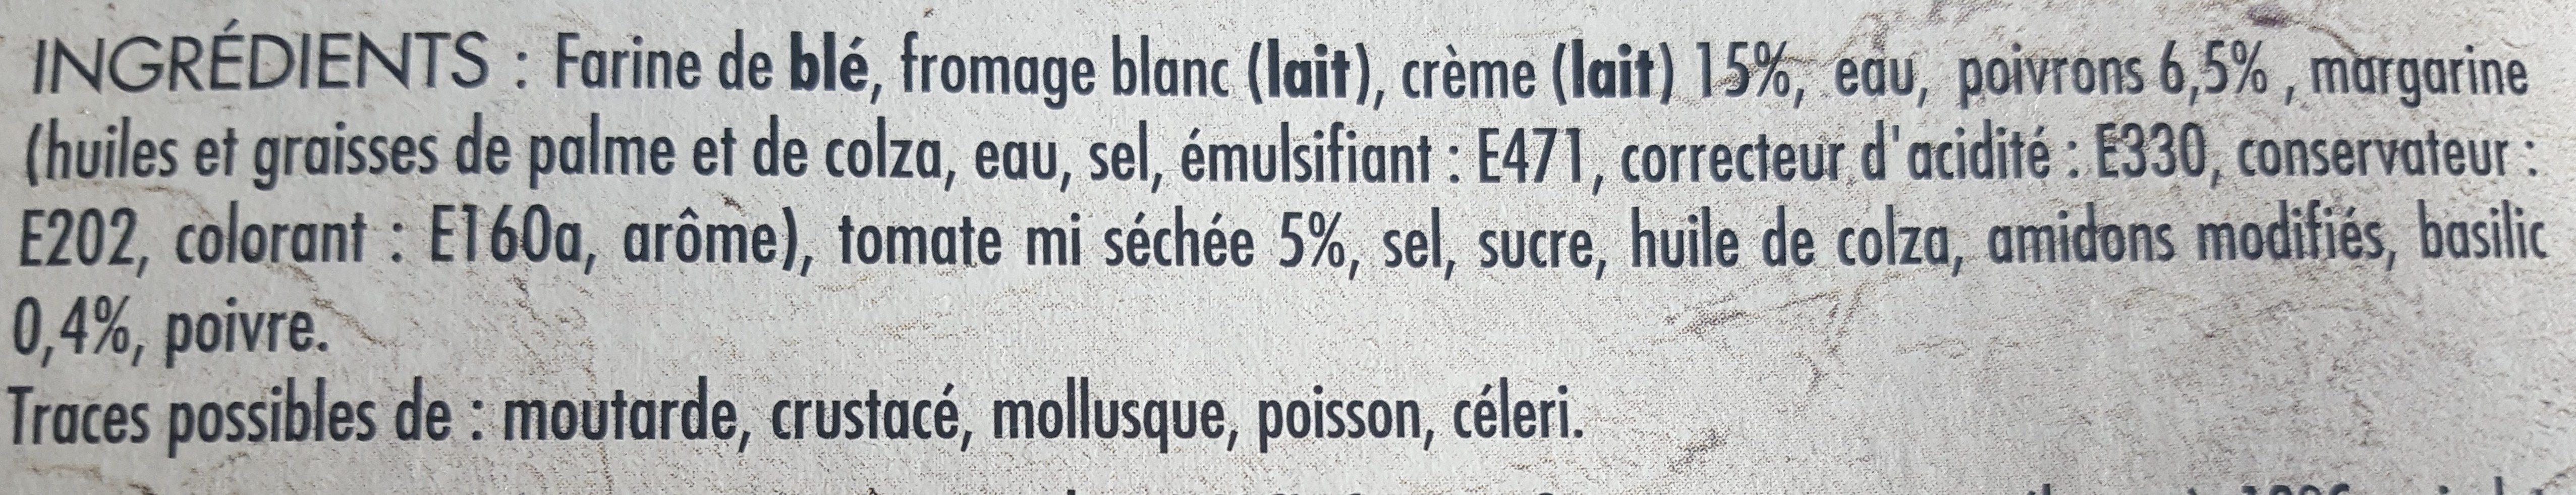 Apéritif aux légumes du soleil - Ingrediënten - fr